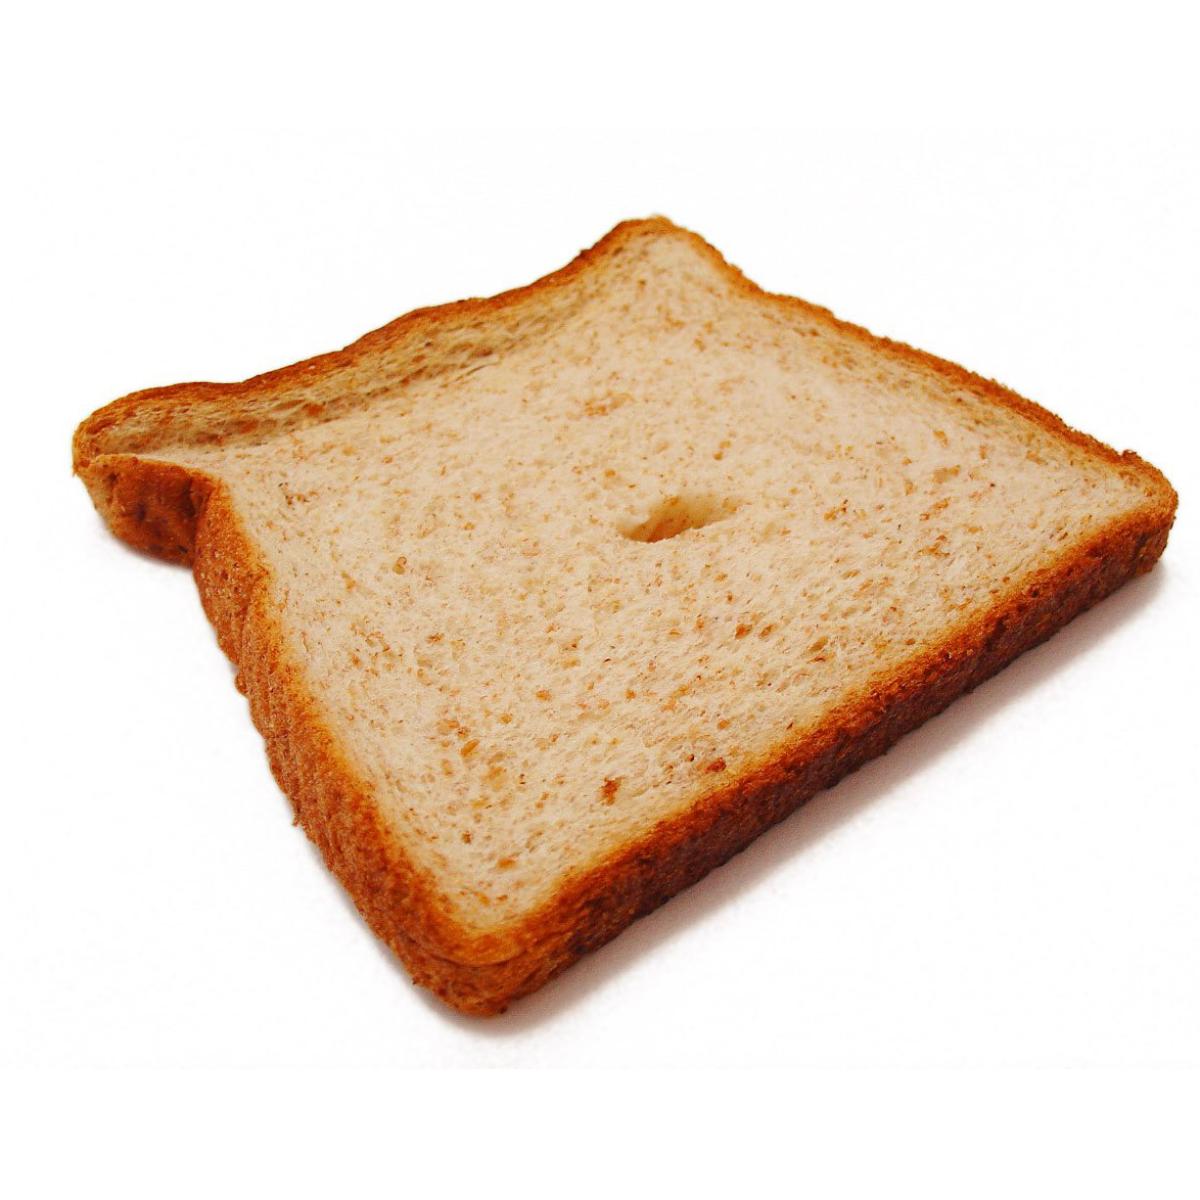 Bonus Breadmaker Patreon Show